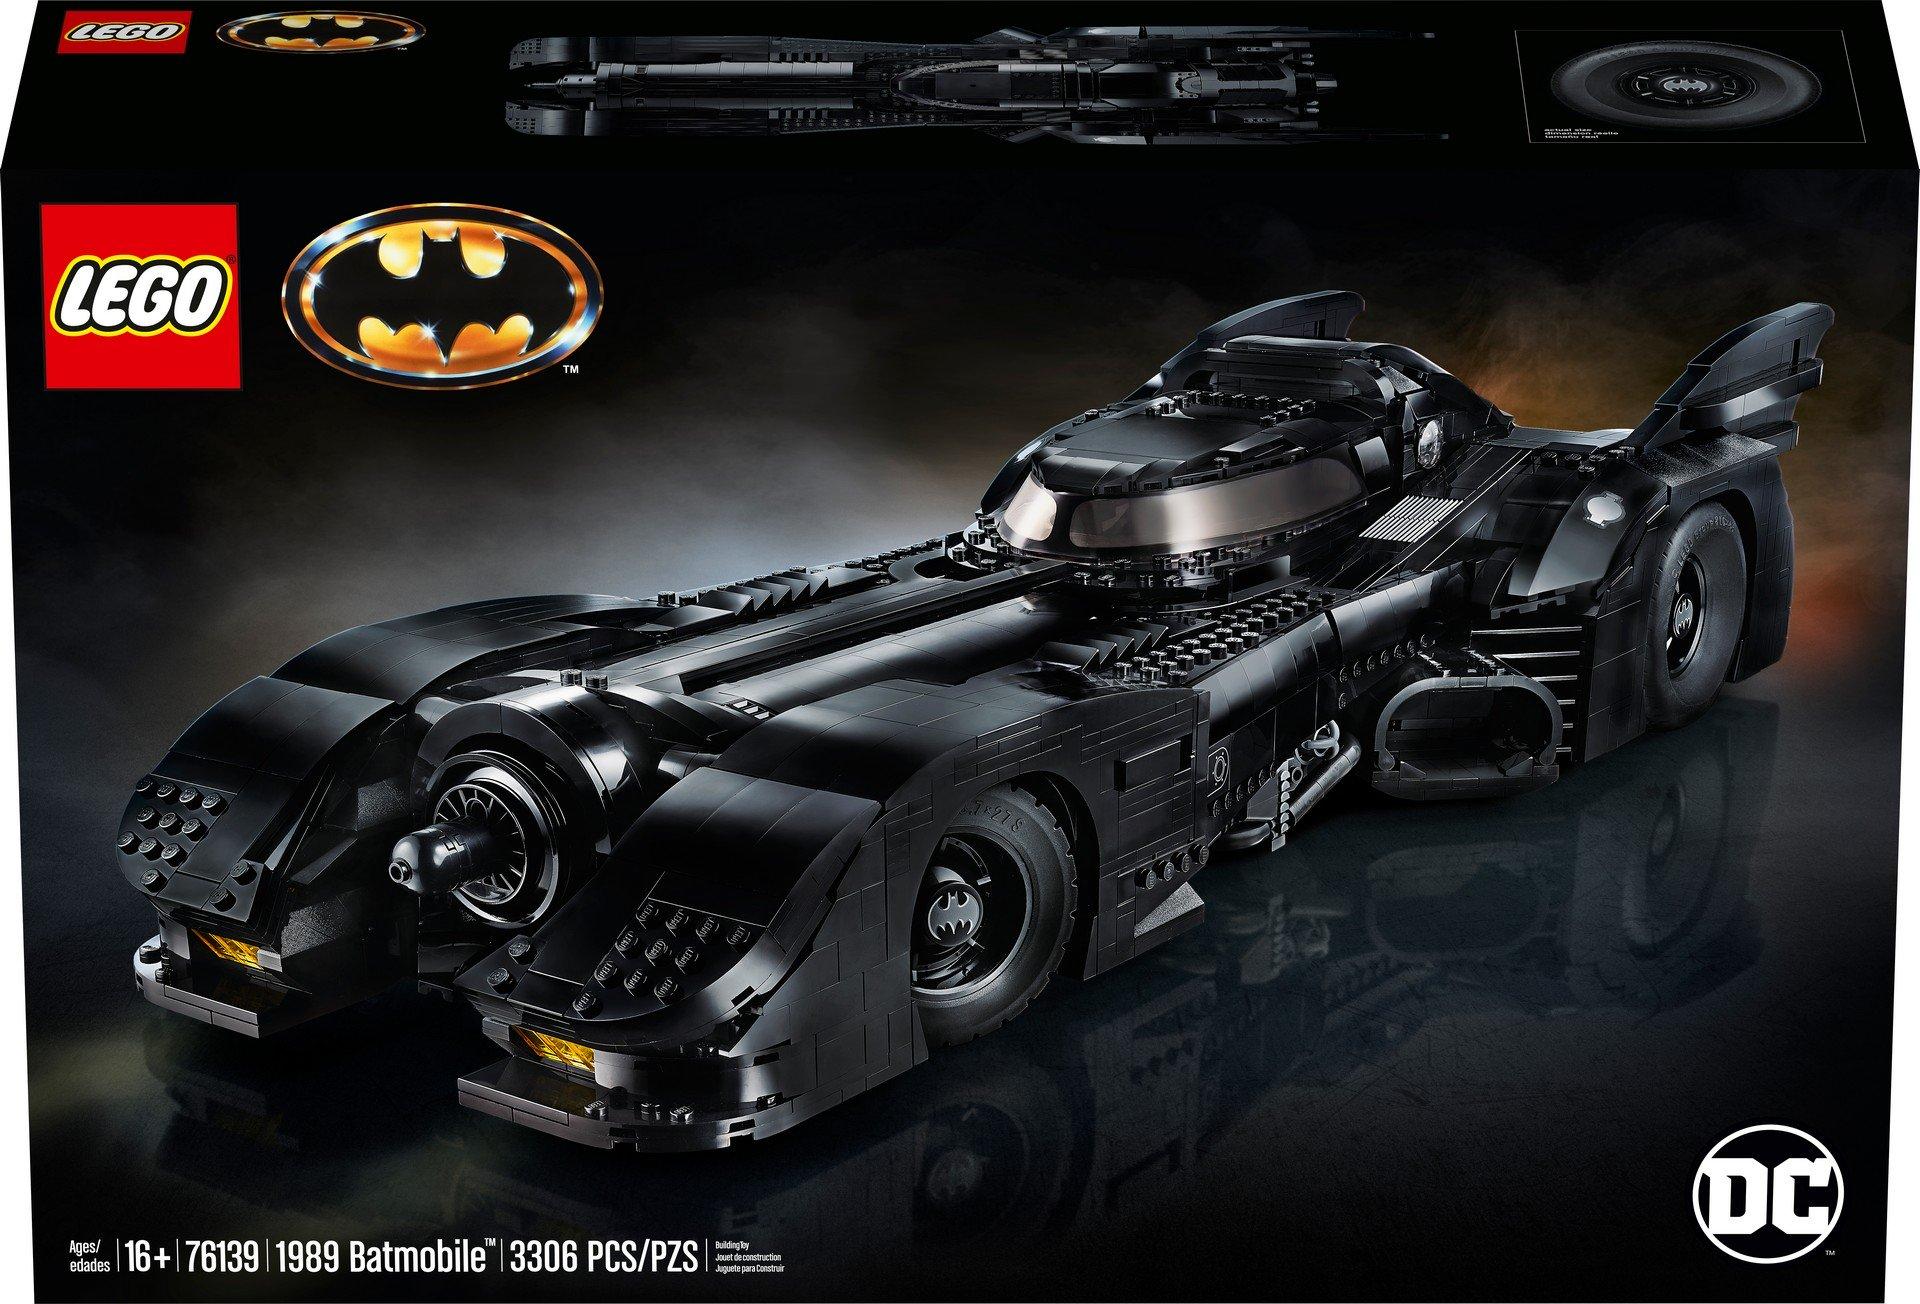 Lego-Batmobile-kit-1989-20